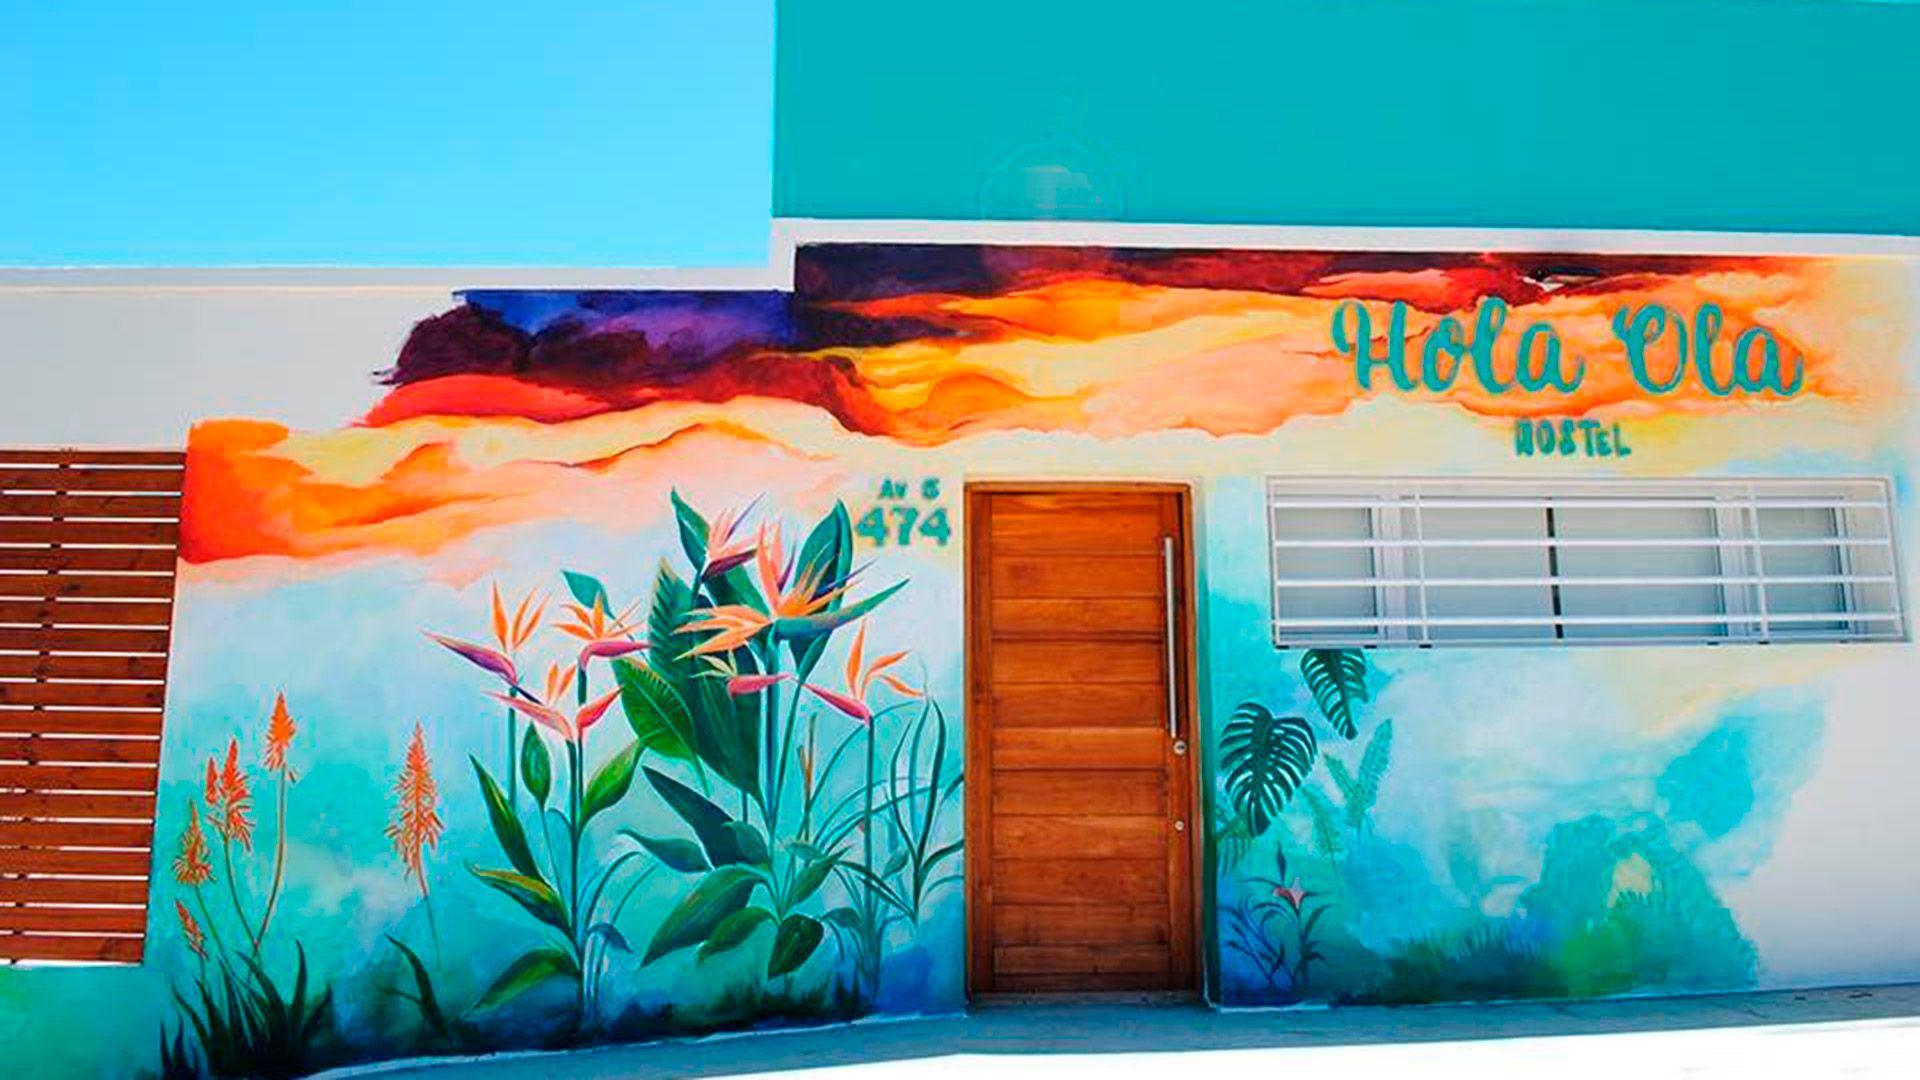 hostel fernando baez sosa villa gesell hola ola